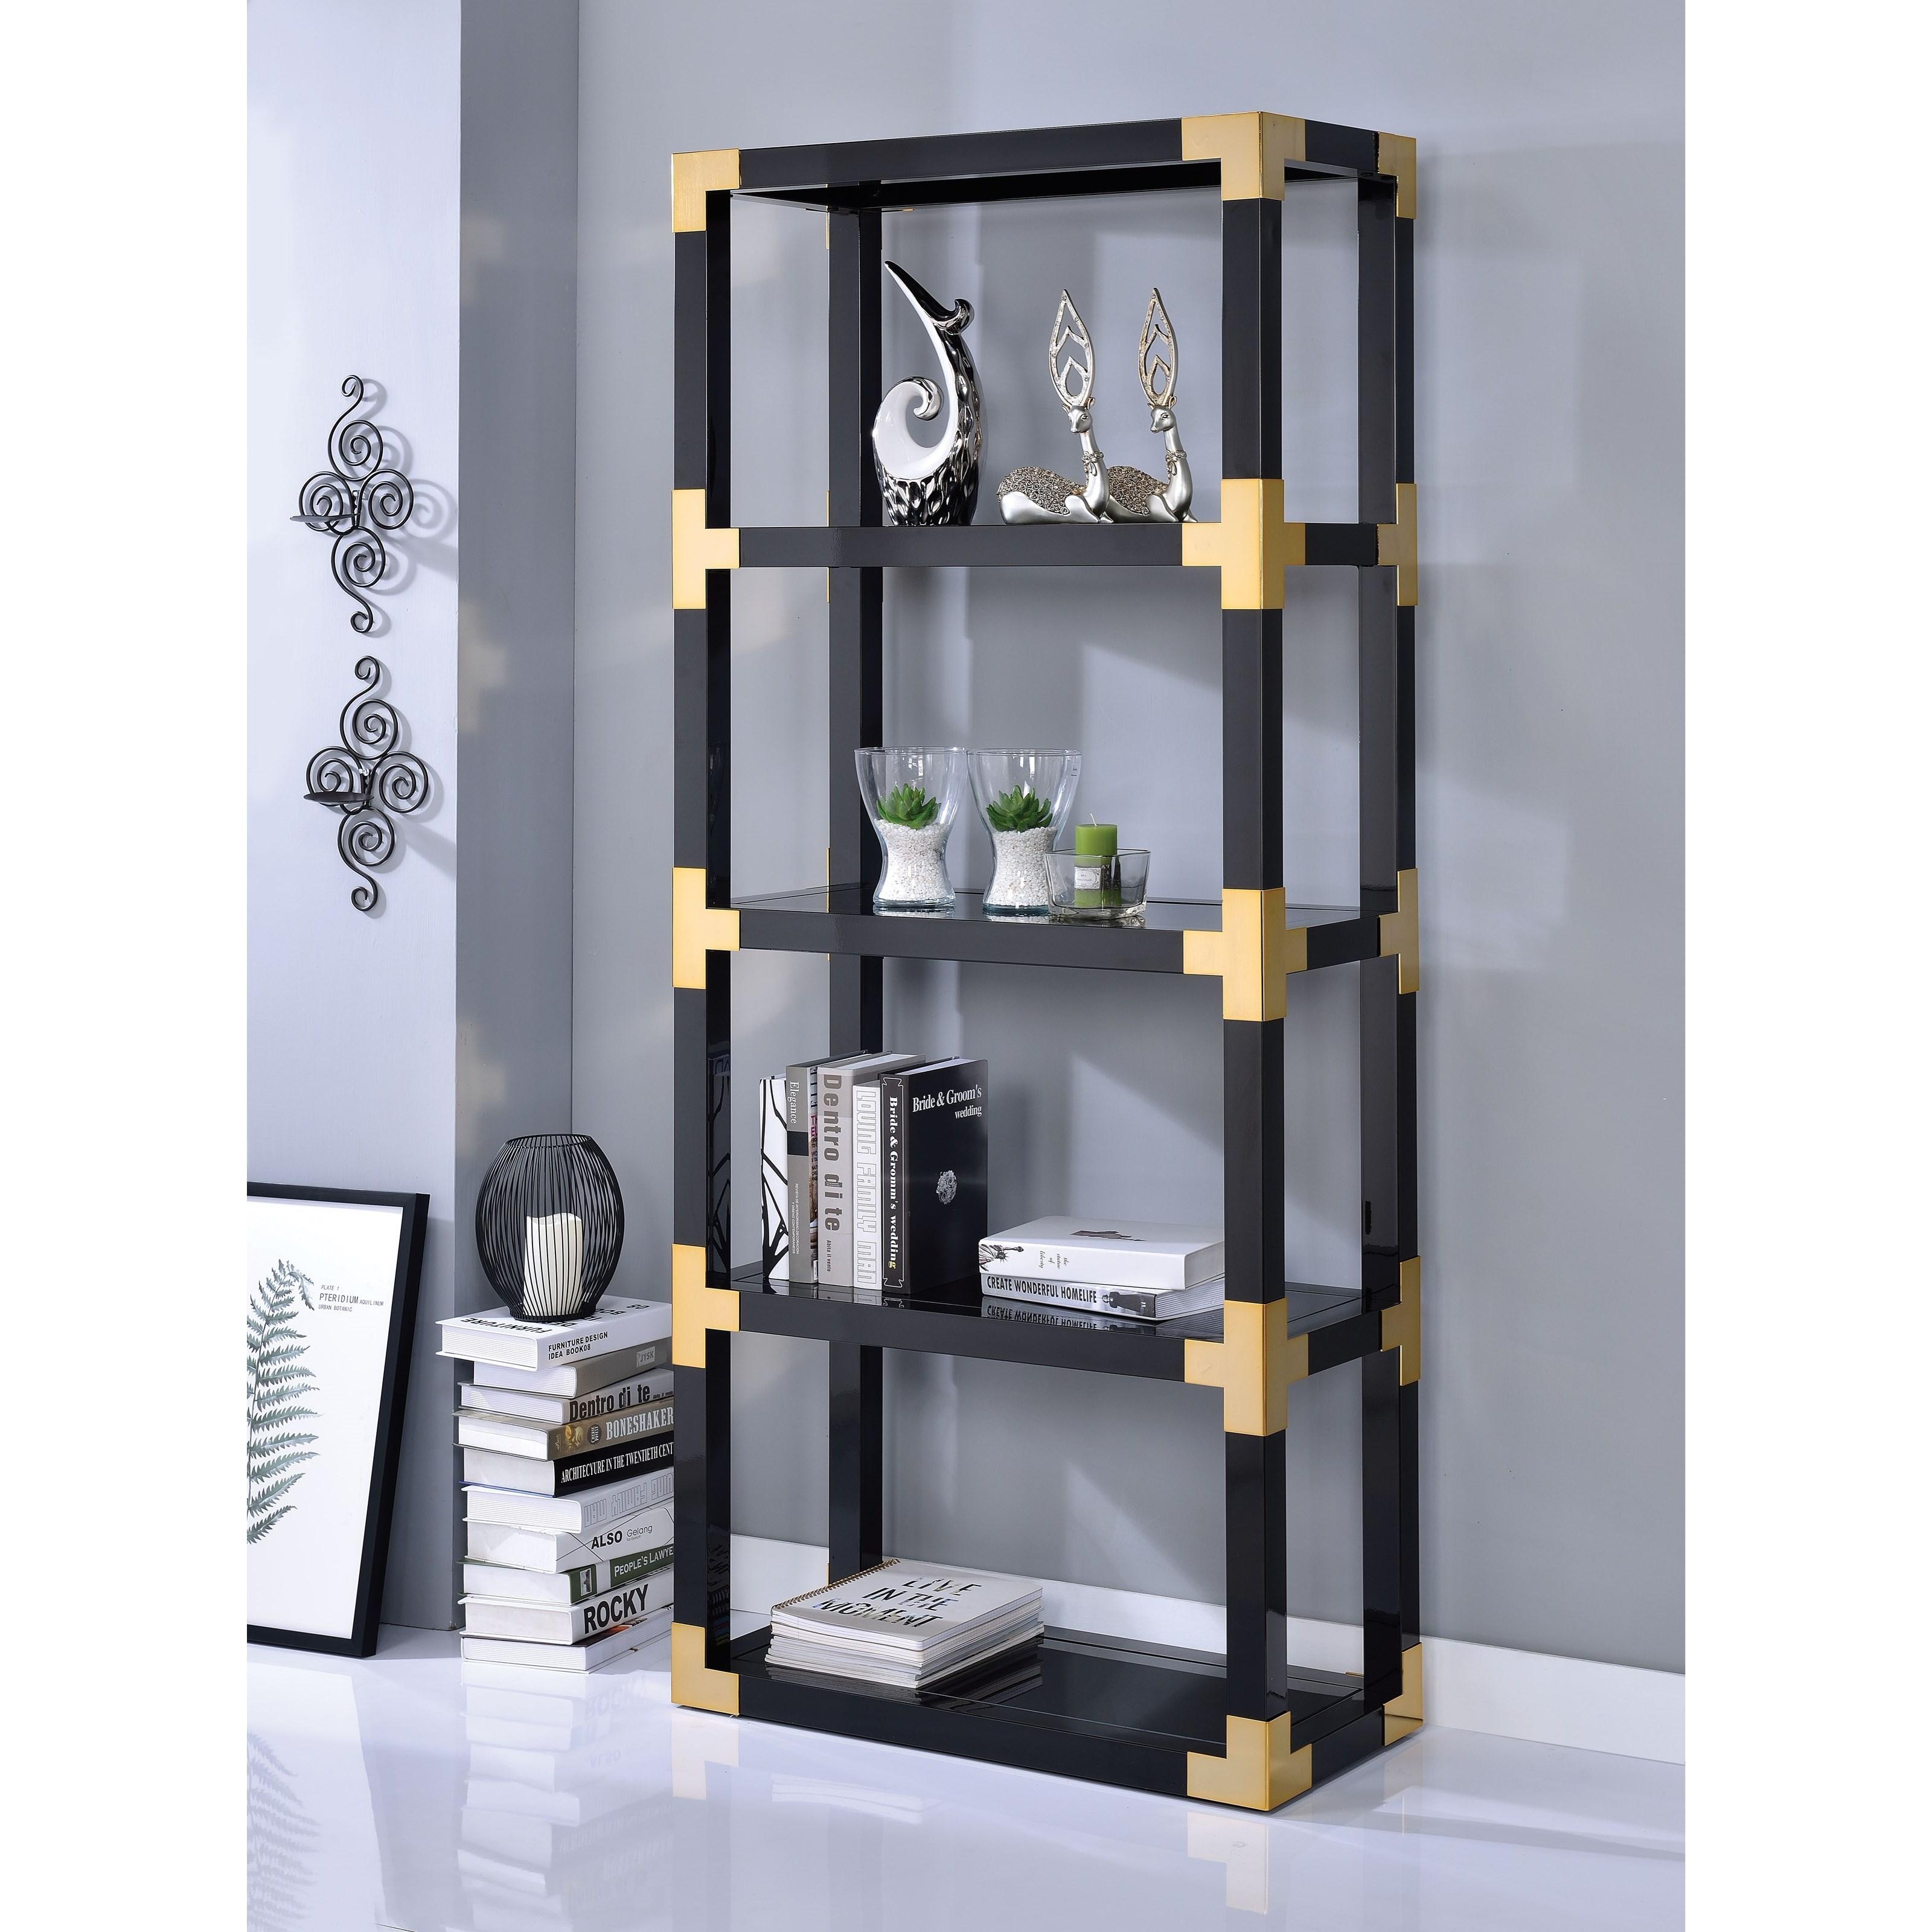 Lafty Bookshelf by Acme Furniture at Del Sol Furniture